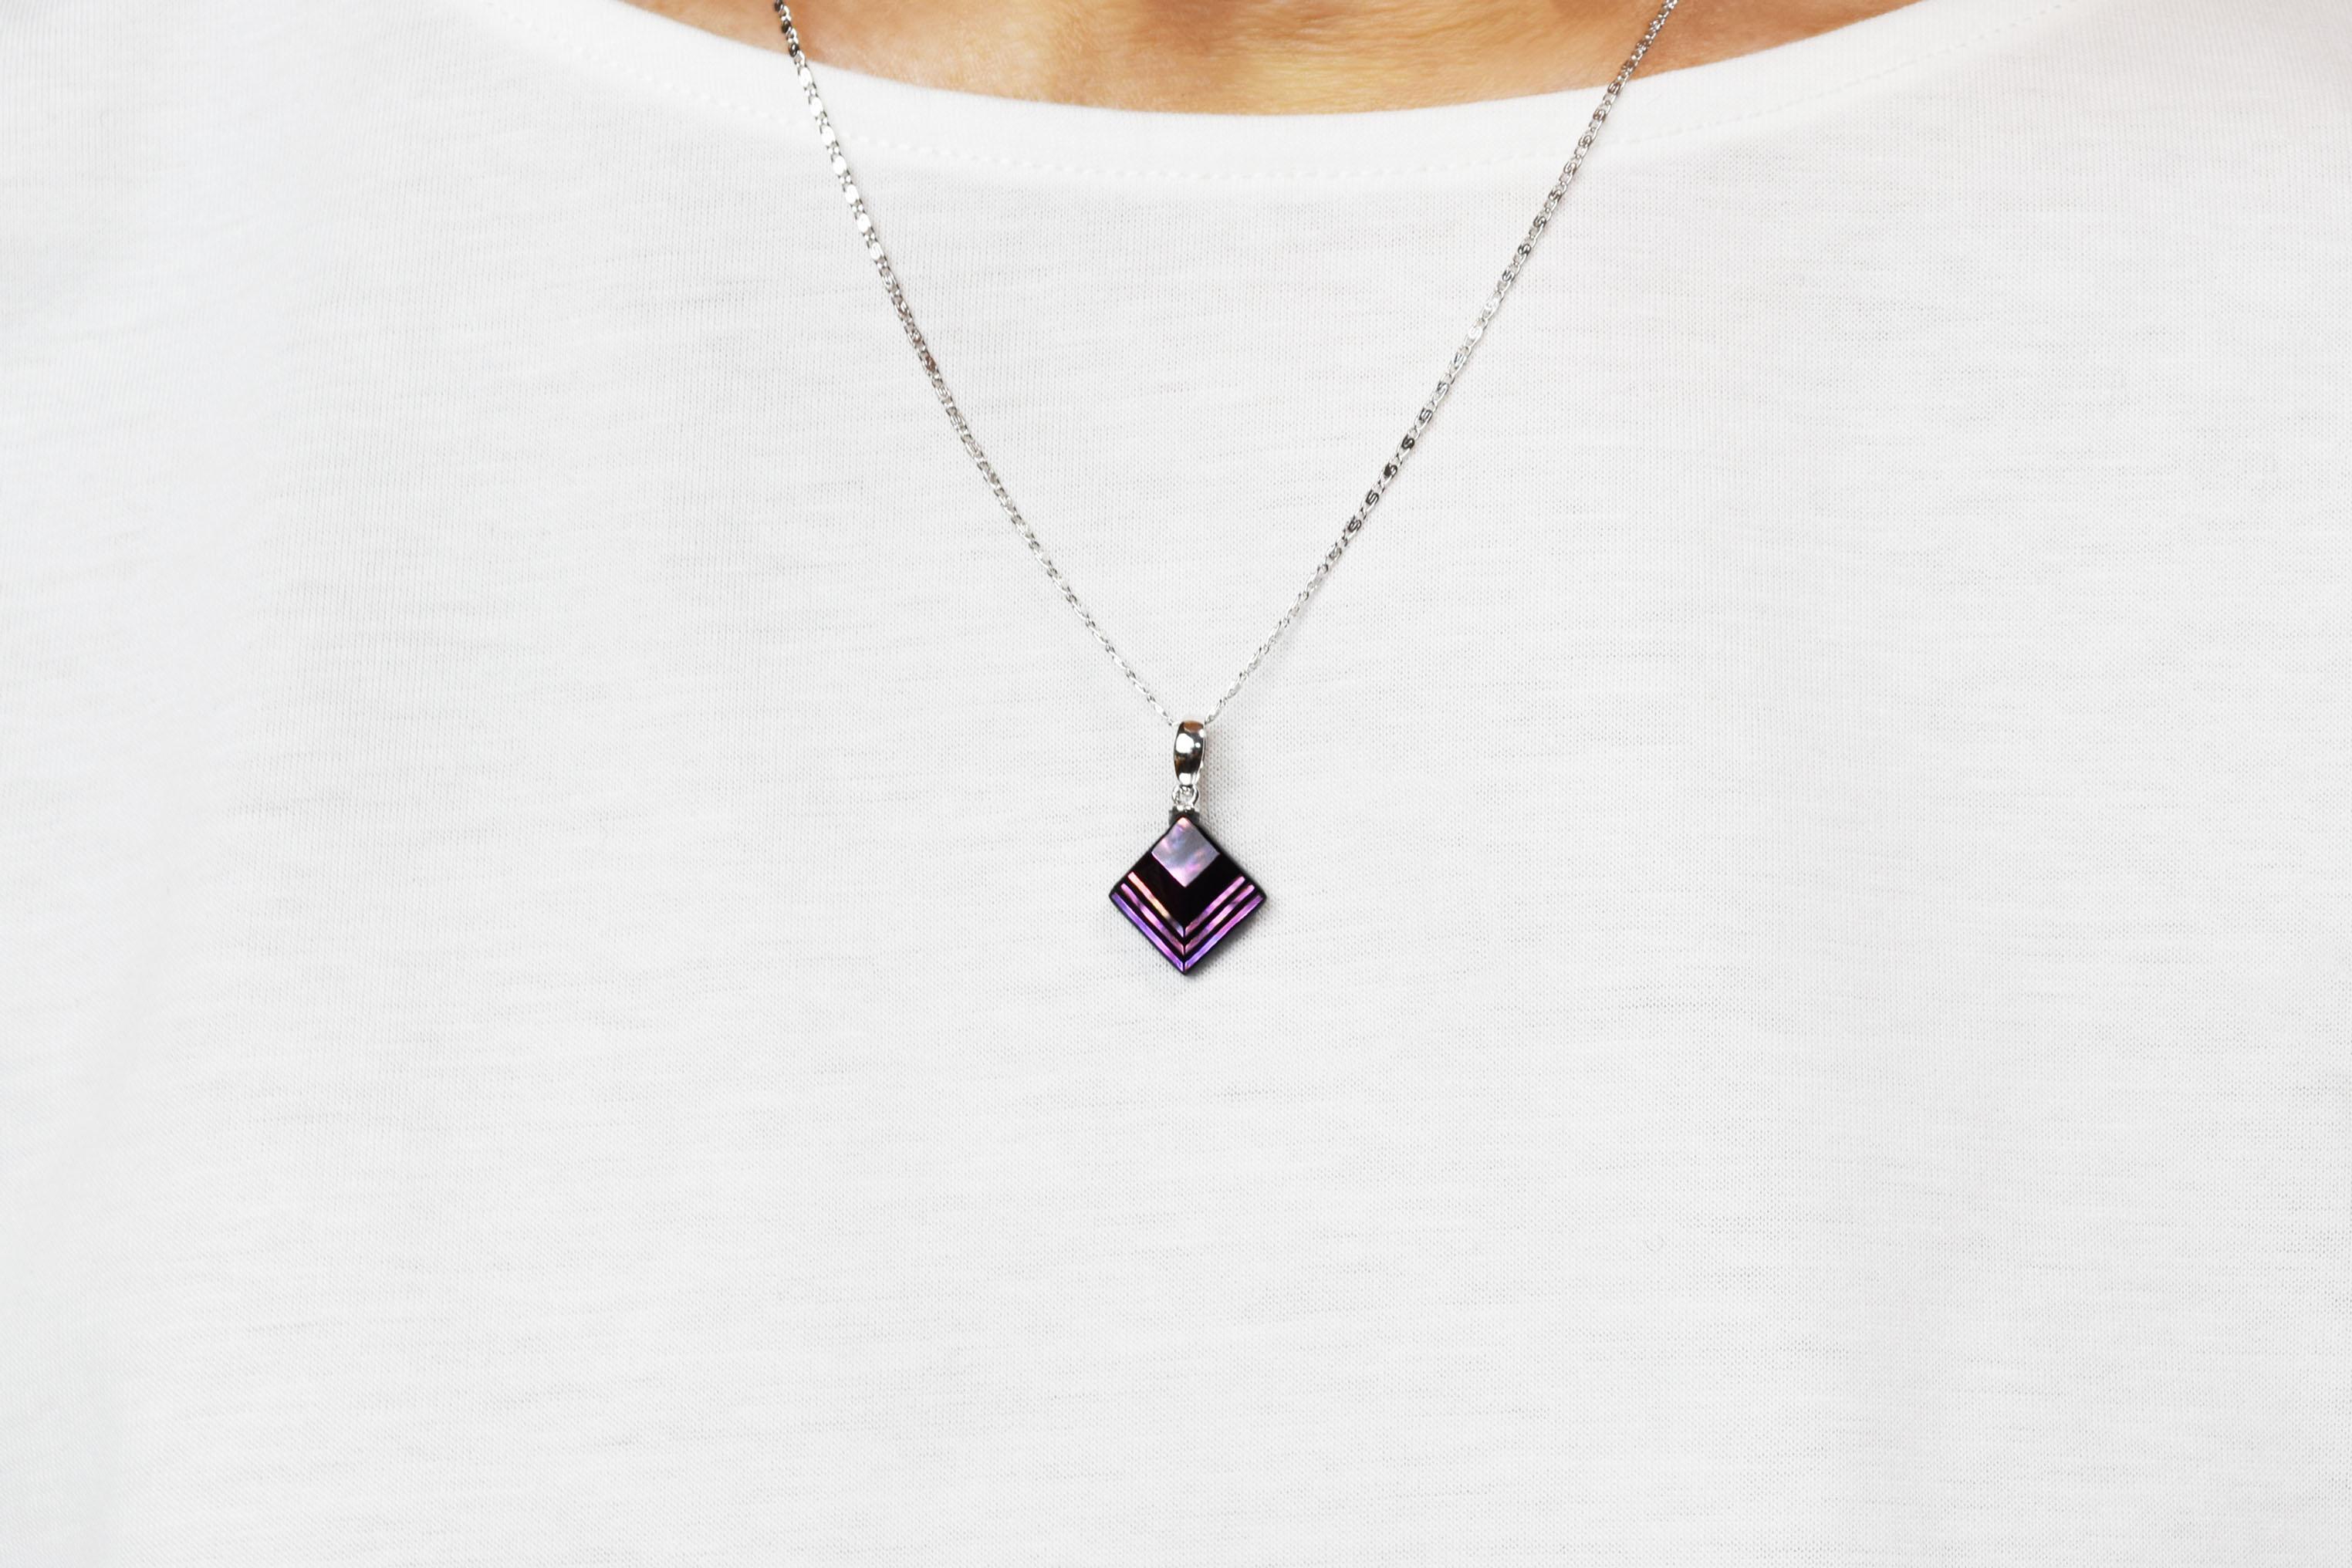 raden_necklace_akari_s_pnk